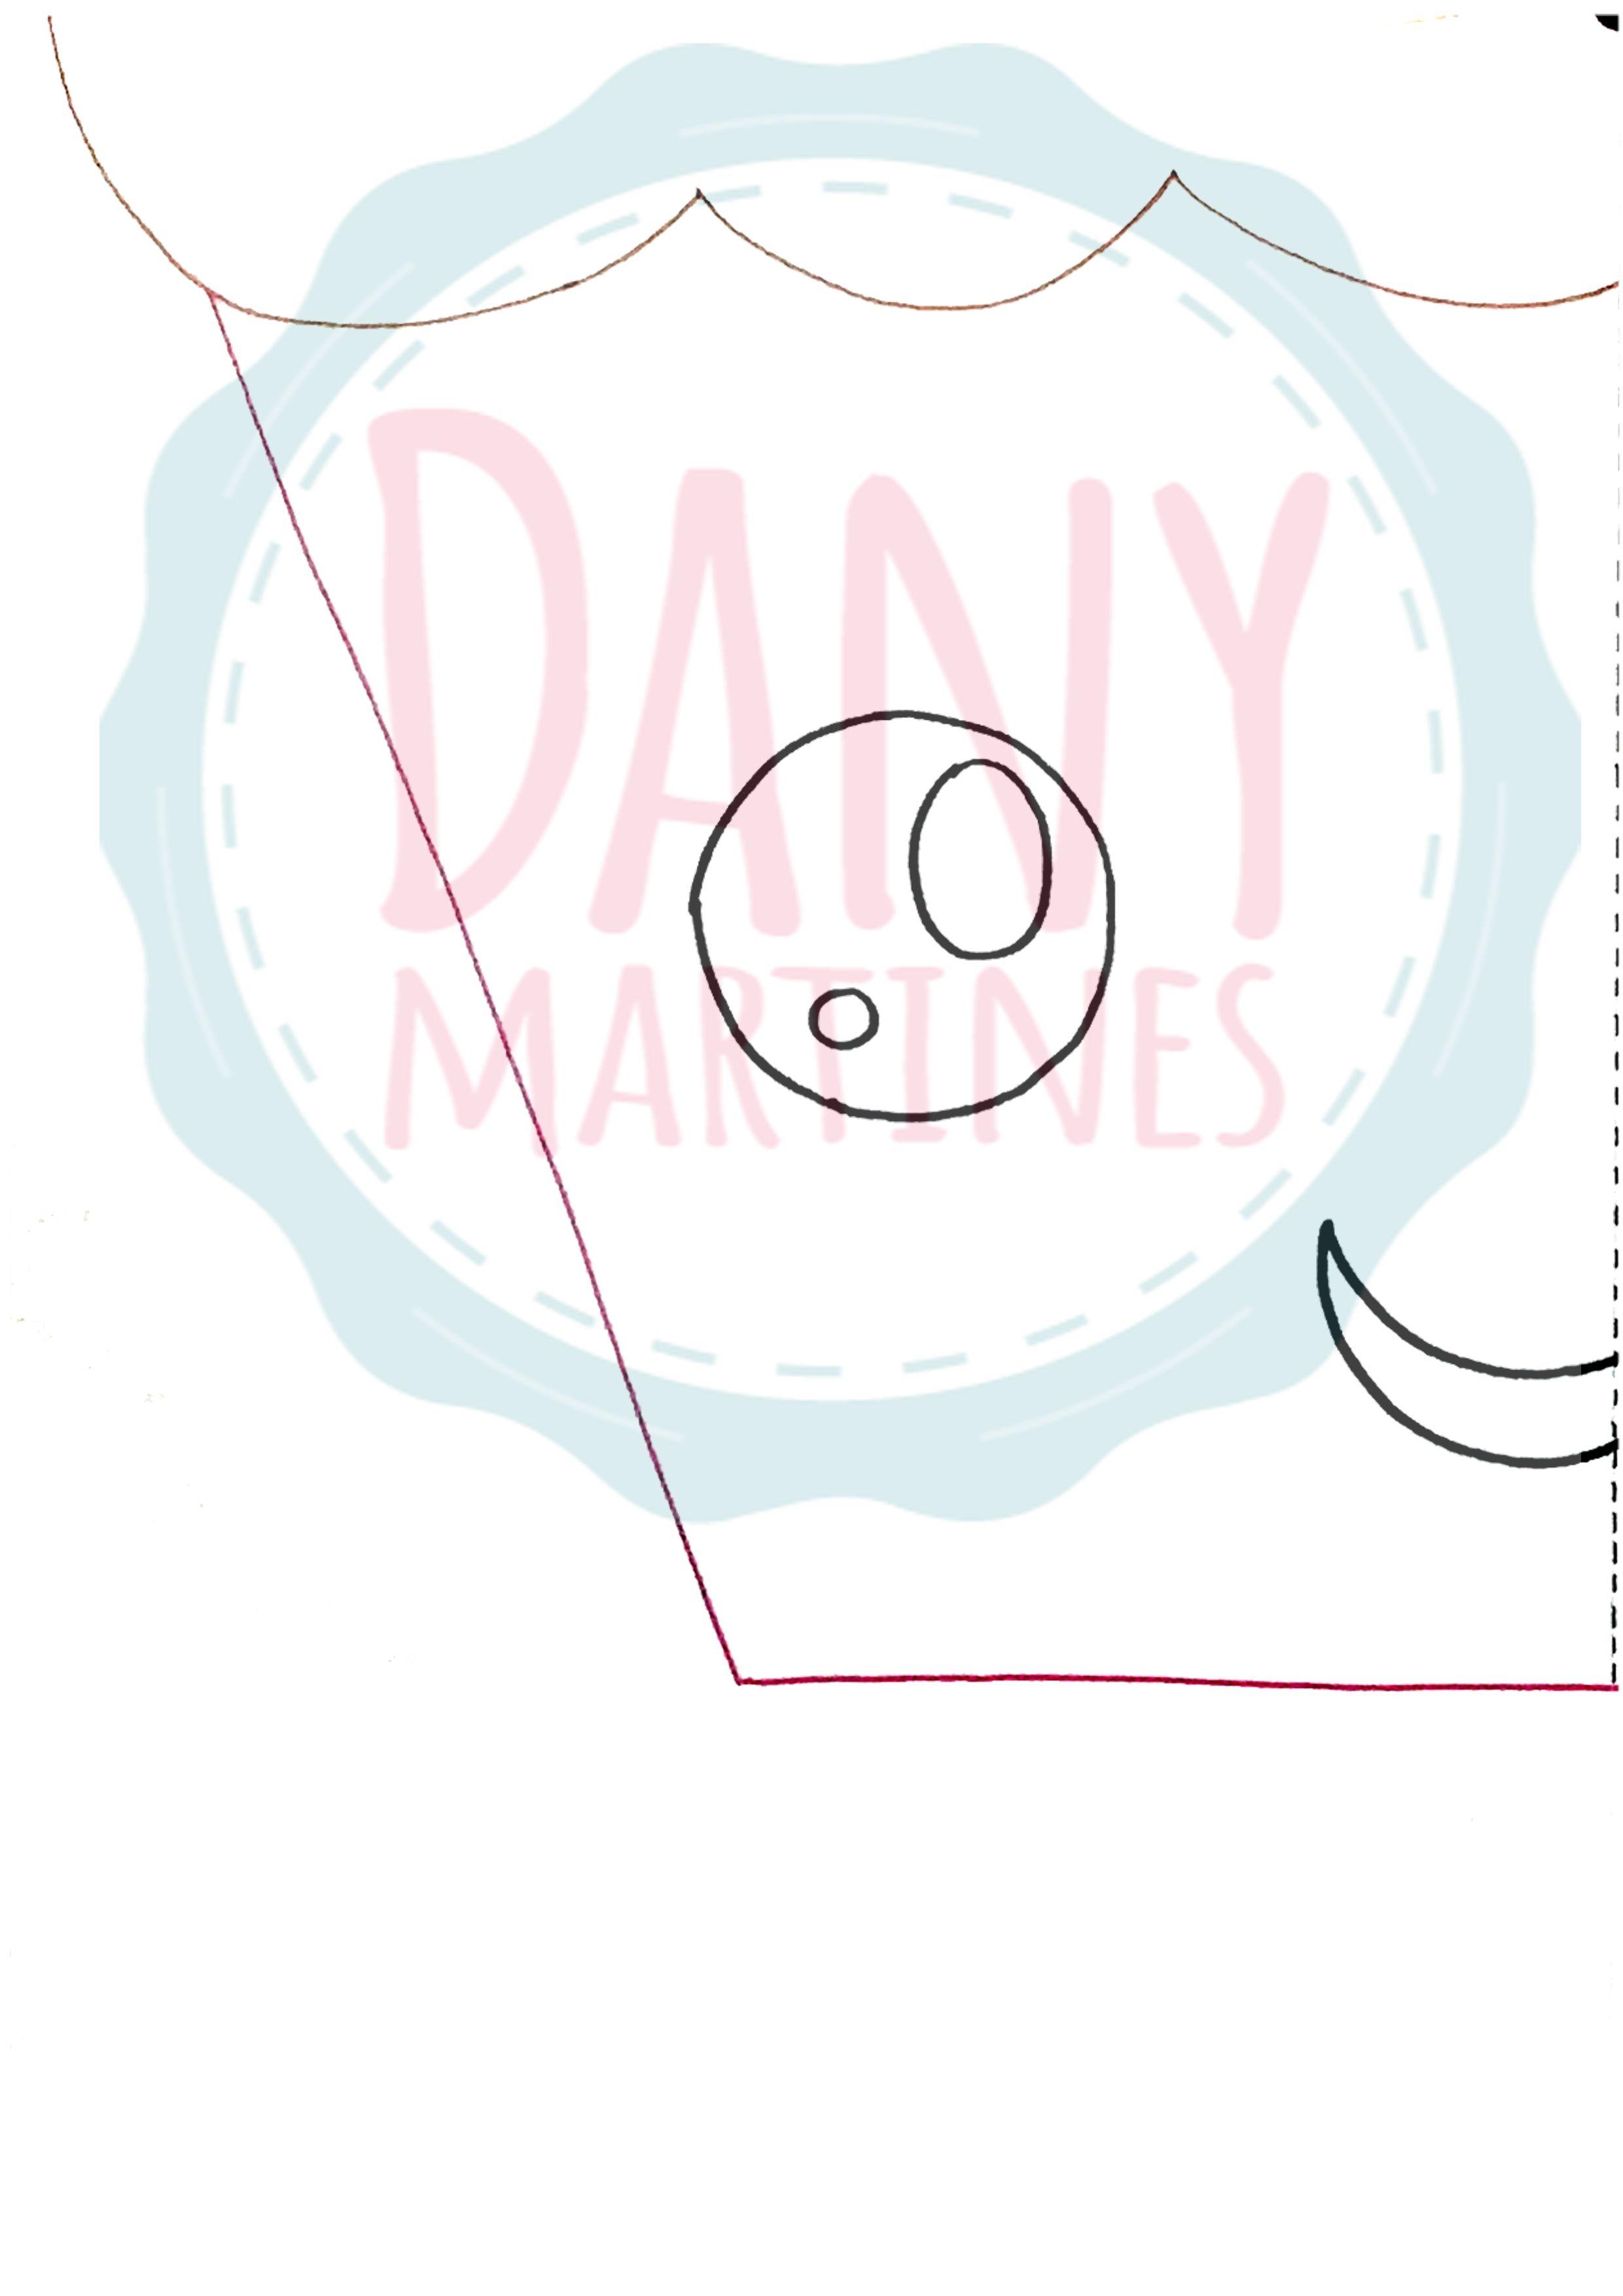 Pin von Maria Cecília auf molde | Pinterest | kreative Ideen ...